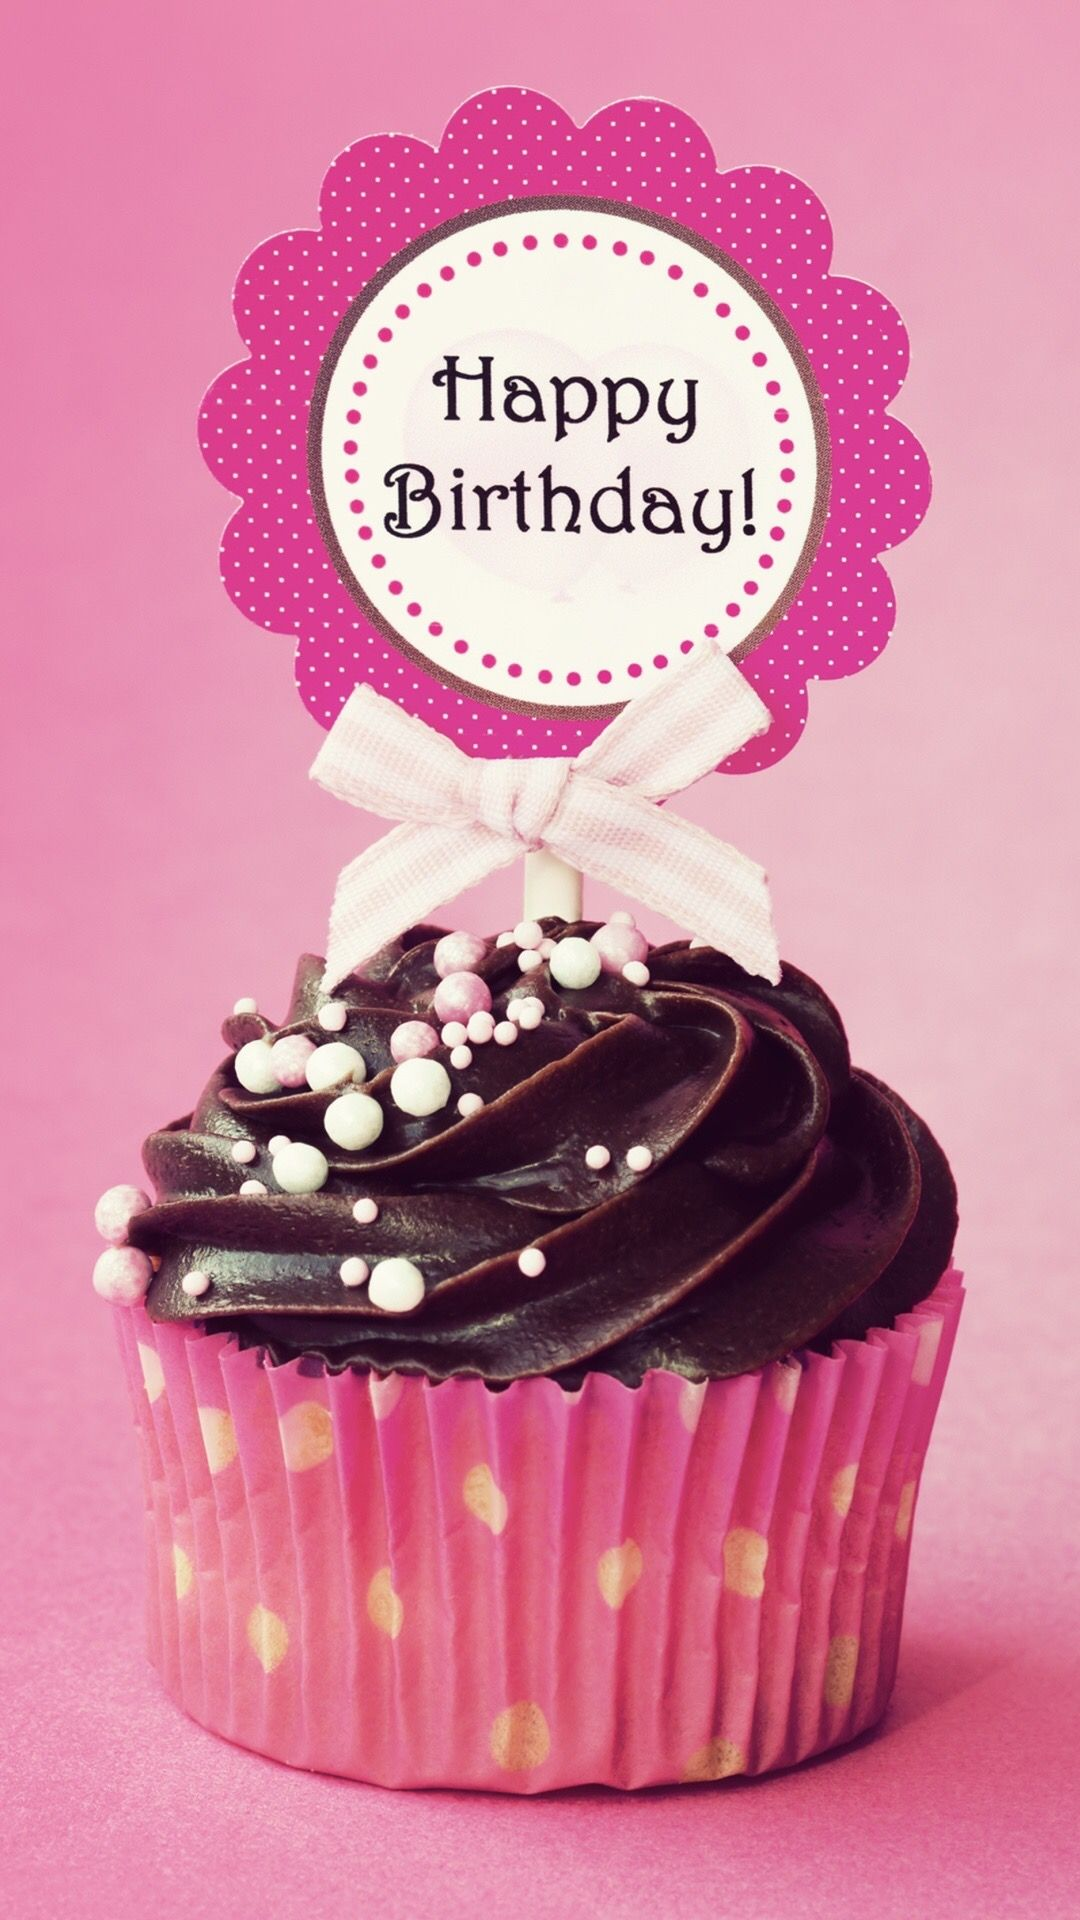 Pin by Dhada Bernabe on Birthday greetings Pinterest